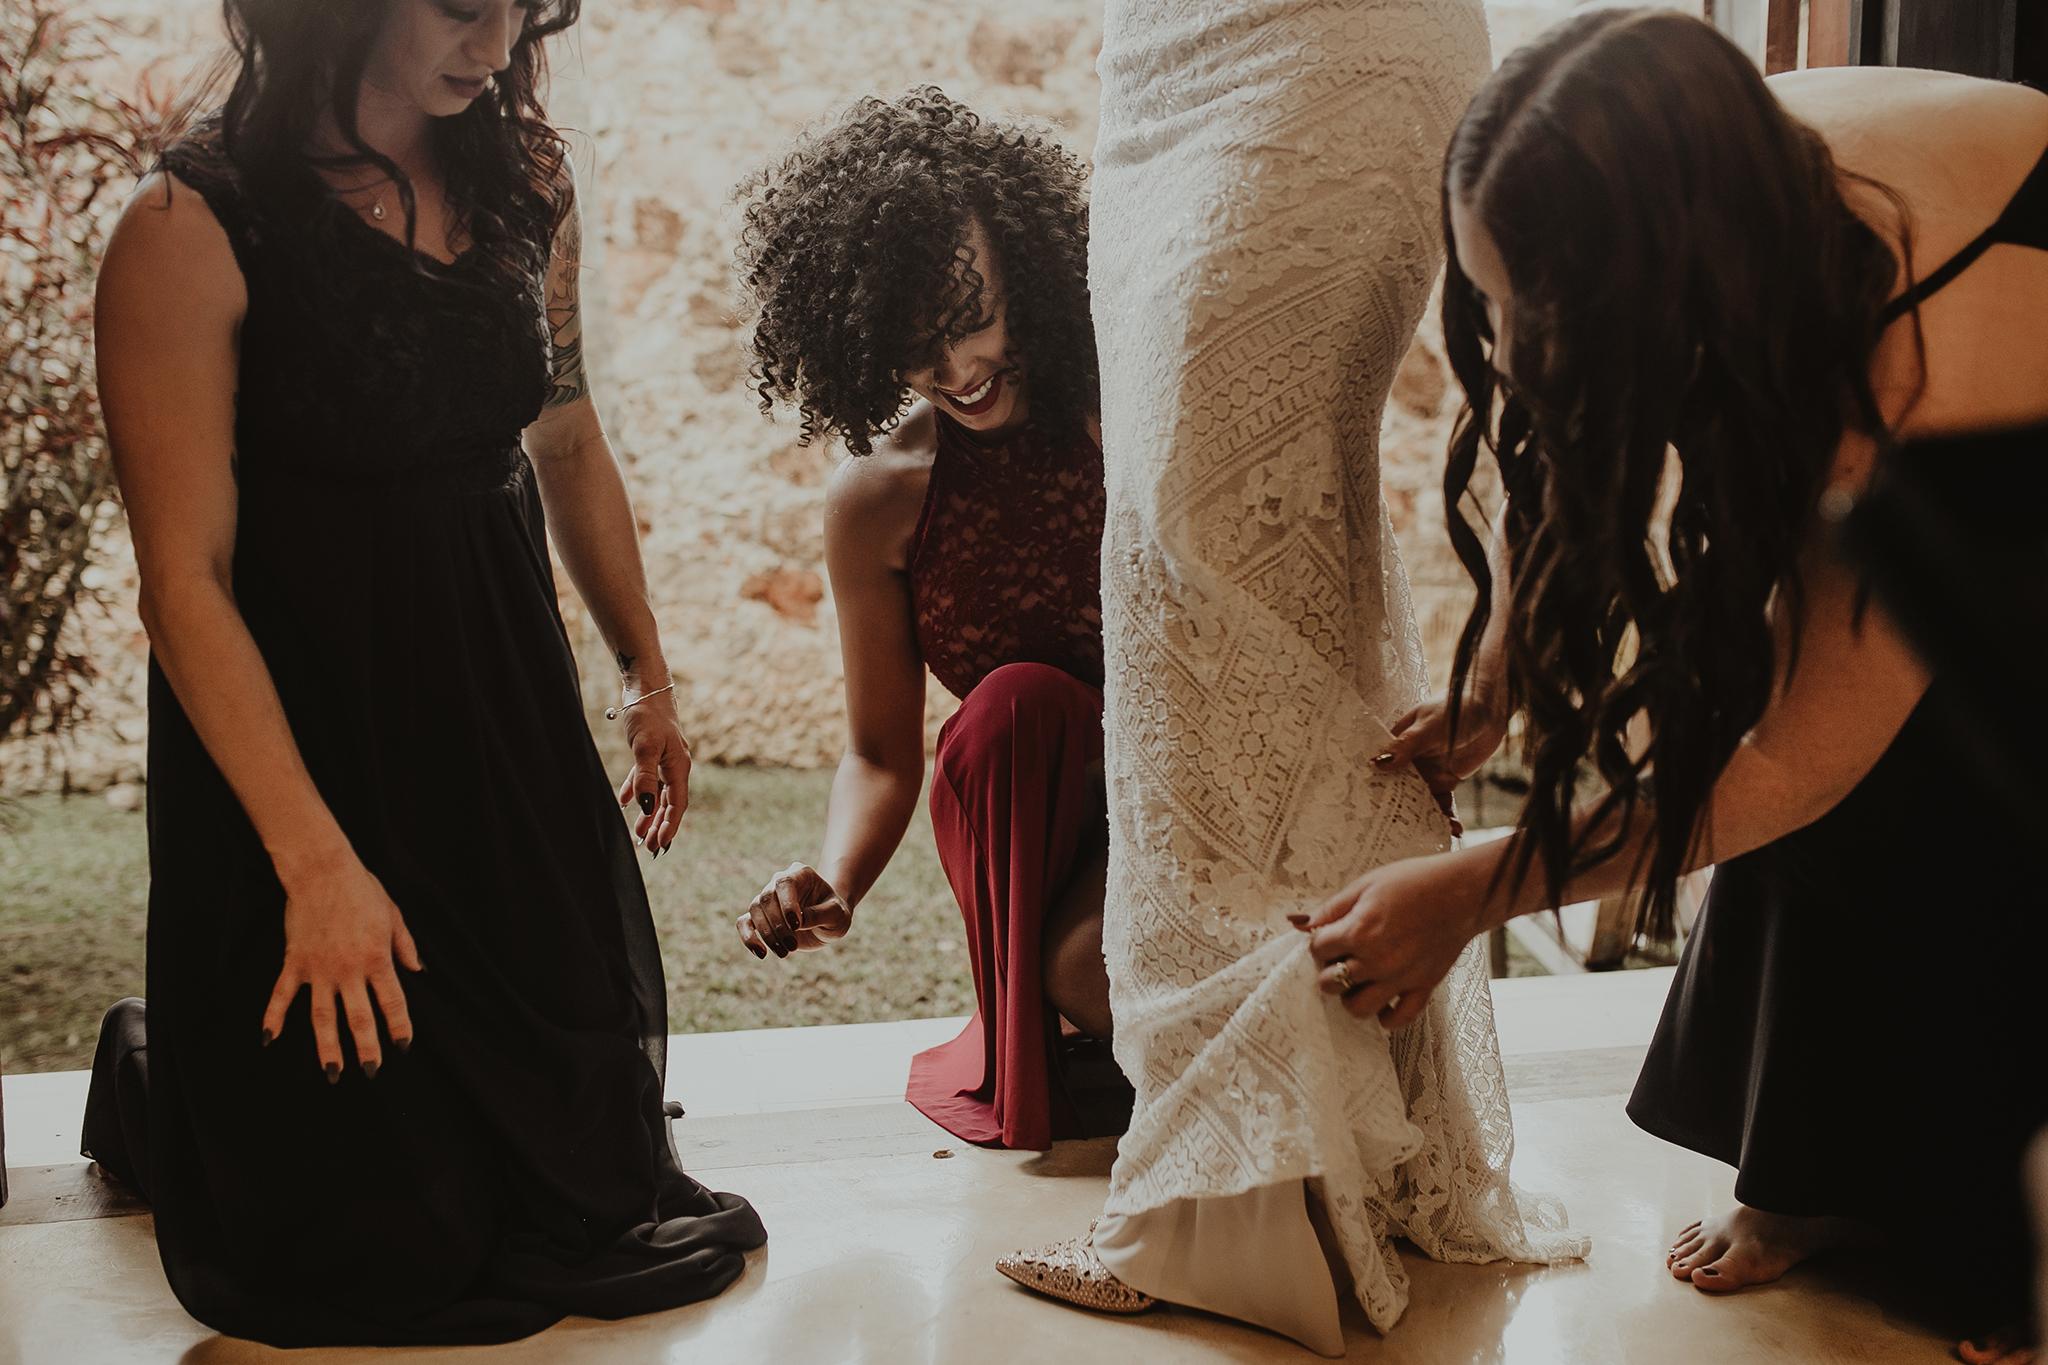 0067V&Aslide_HaciendaSacChic_WeddingGay_WeddingDstination_MeridaYucatan_HaciendasMerida_BodasMexico_BodasYucatan_Boda_Destino.jpg